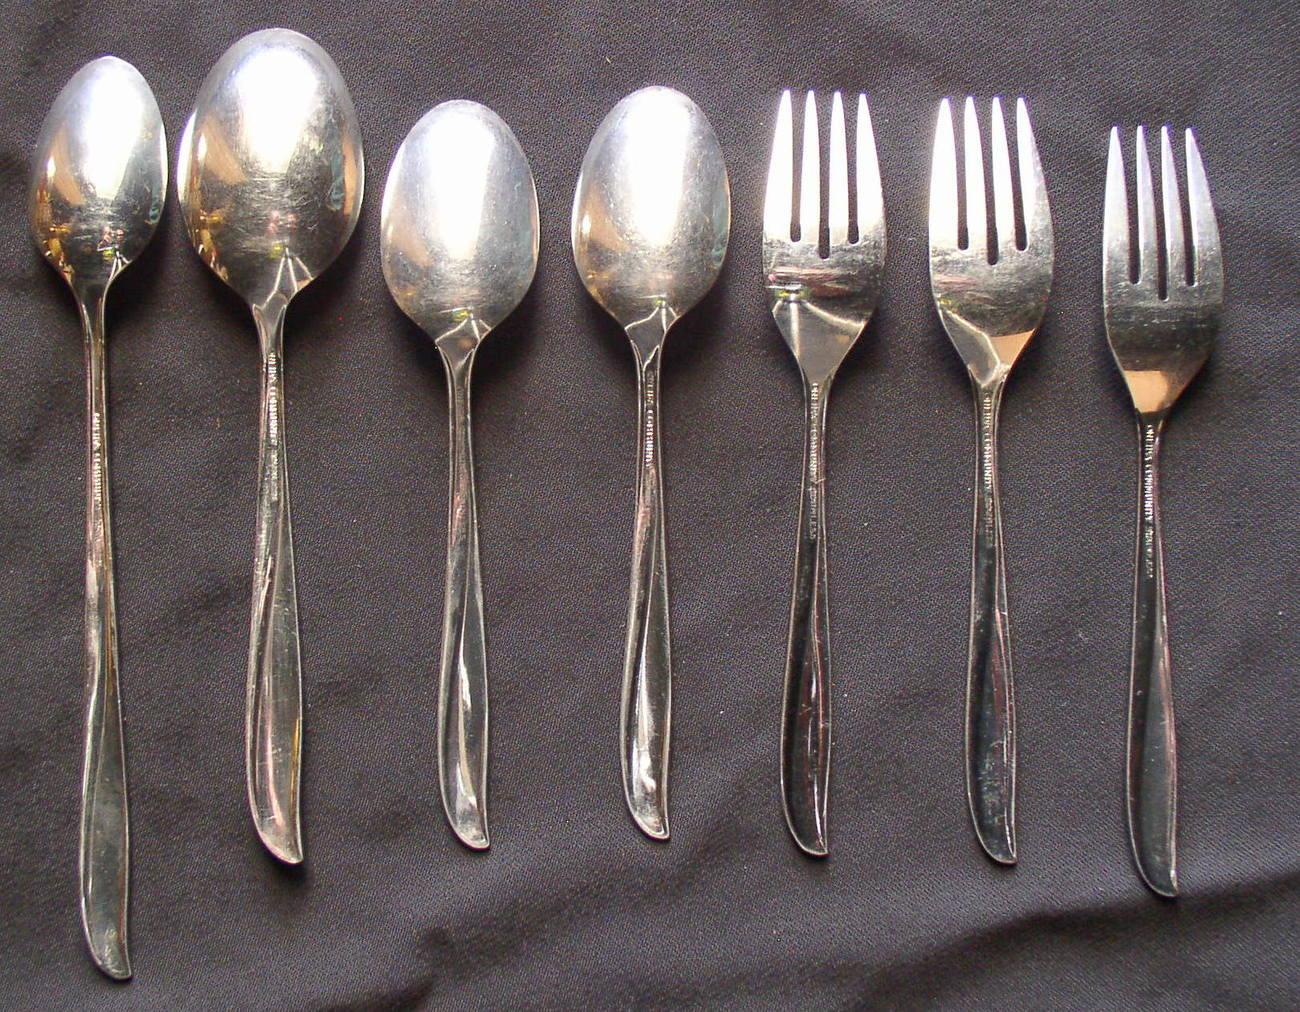 Oneida community stainless twin star flatware spoons forks for Oneida flatware